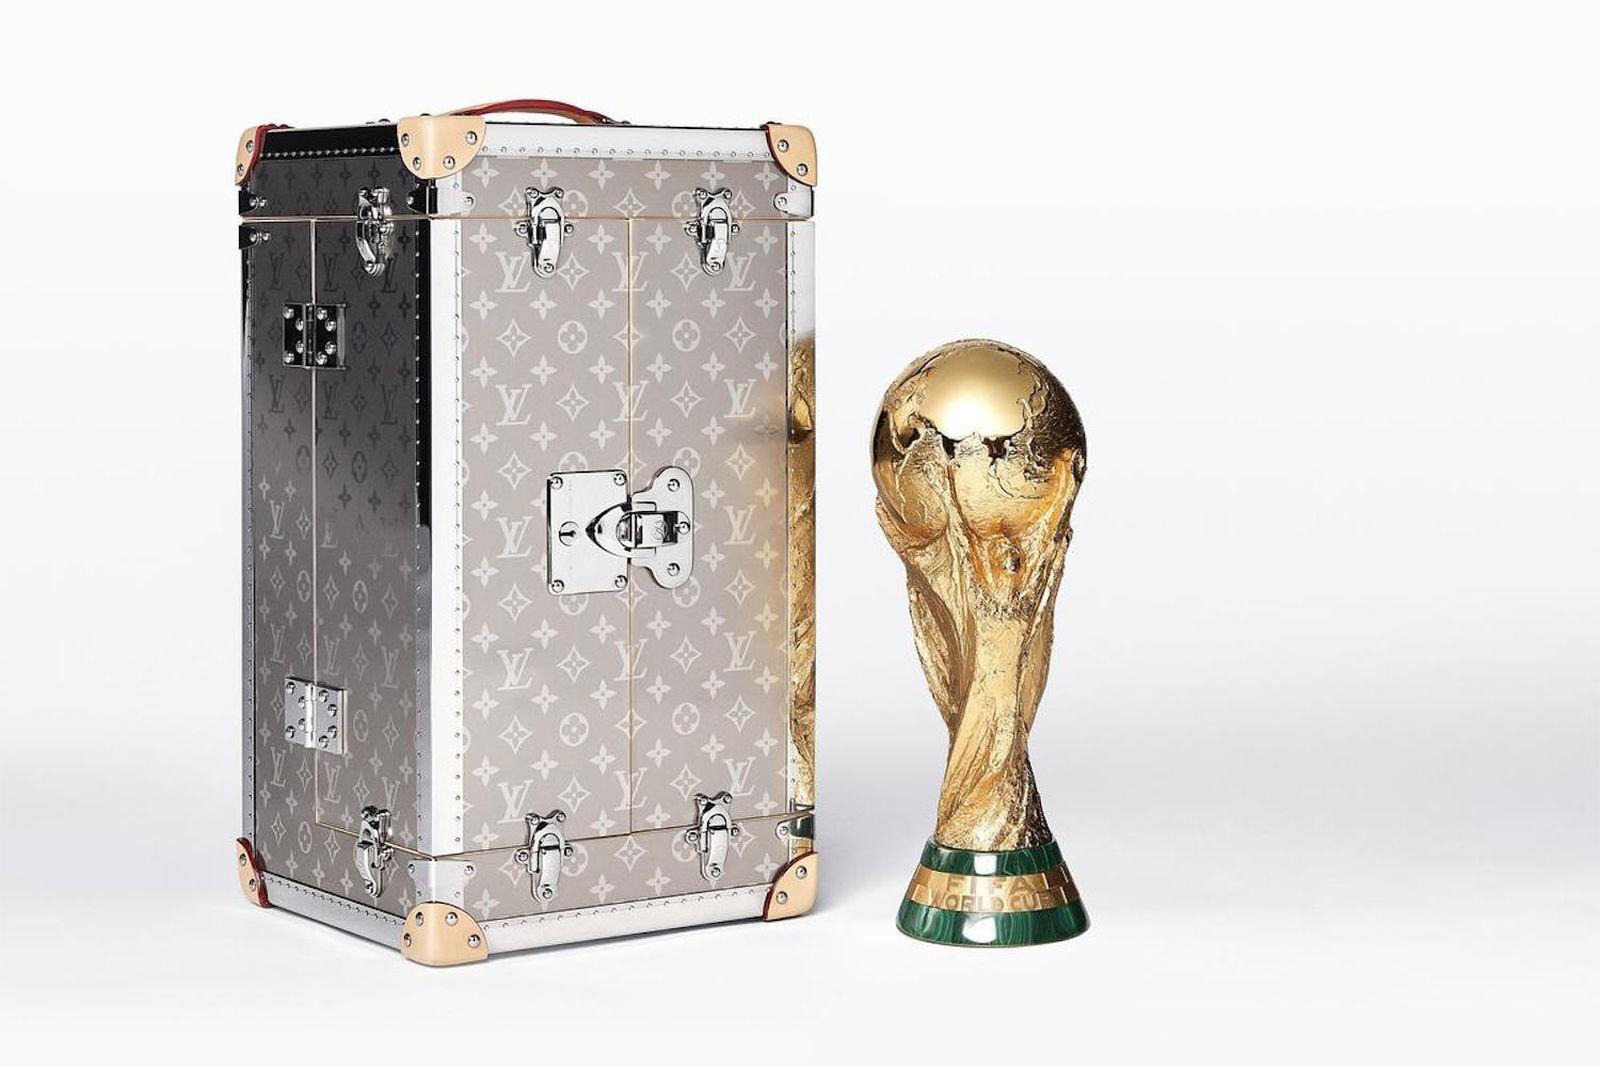 louis vuitton fifa world cup original trophy travel case 2018 FIFA World Cup